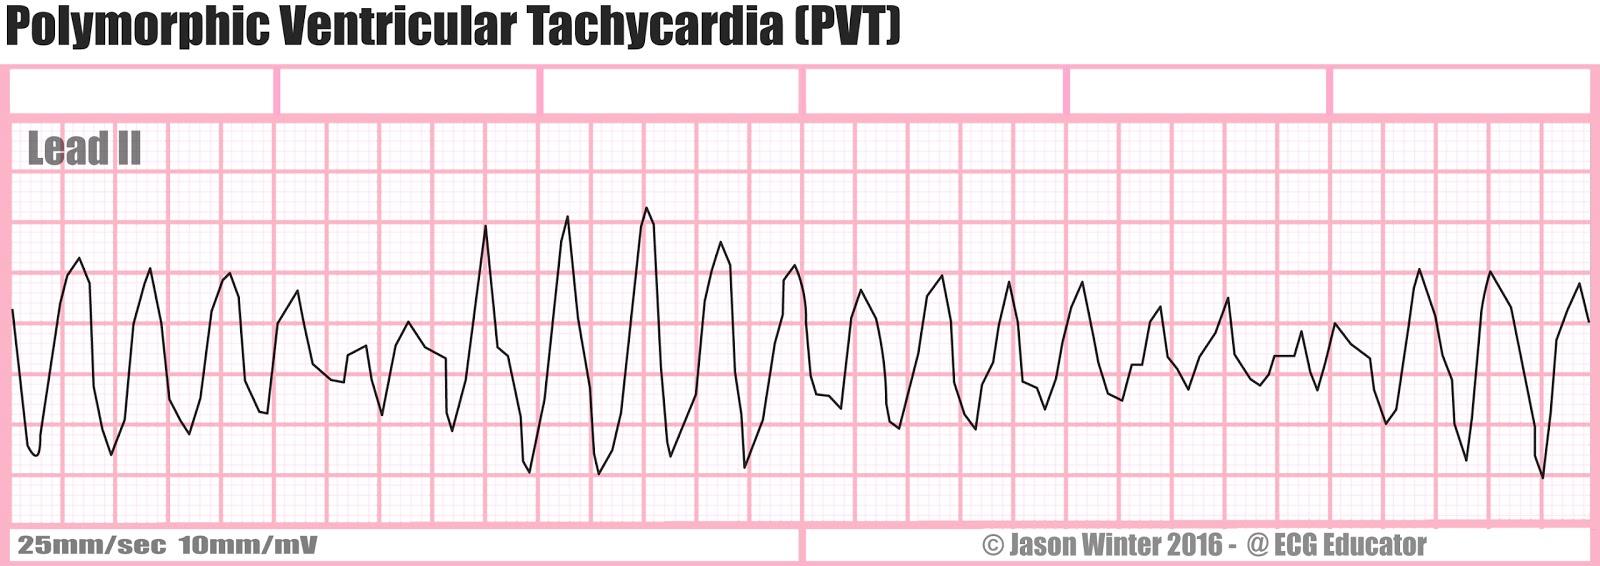 ECG Educator Blog : Polymorphic Ventricular Tachycardia (PVT)